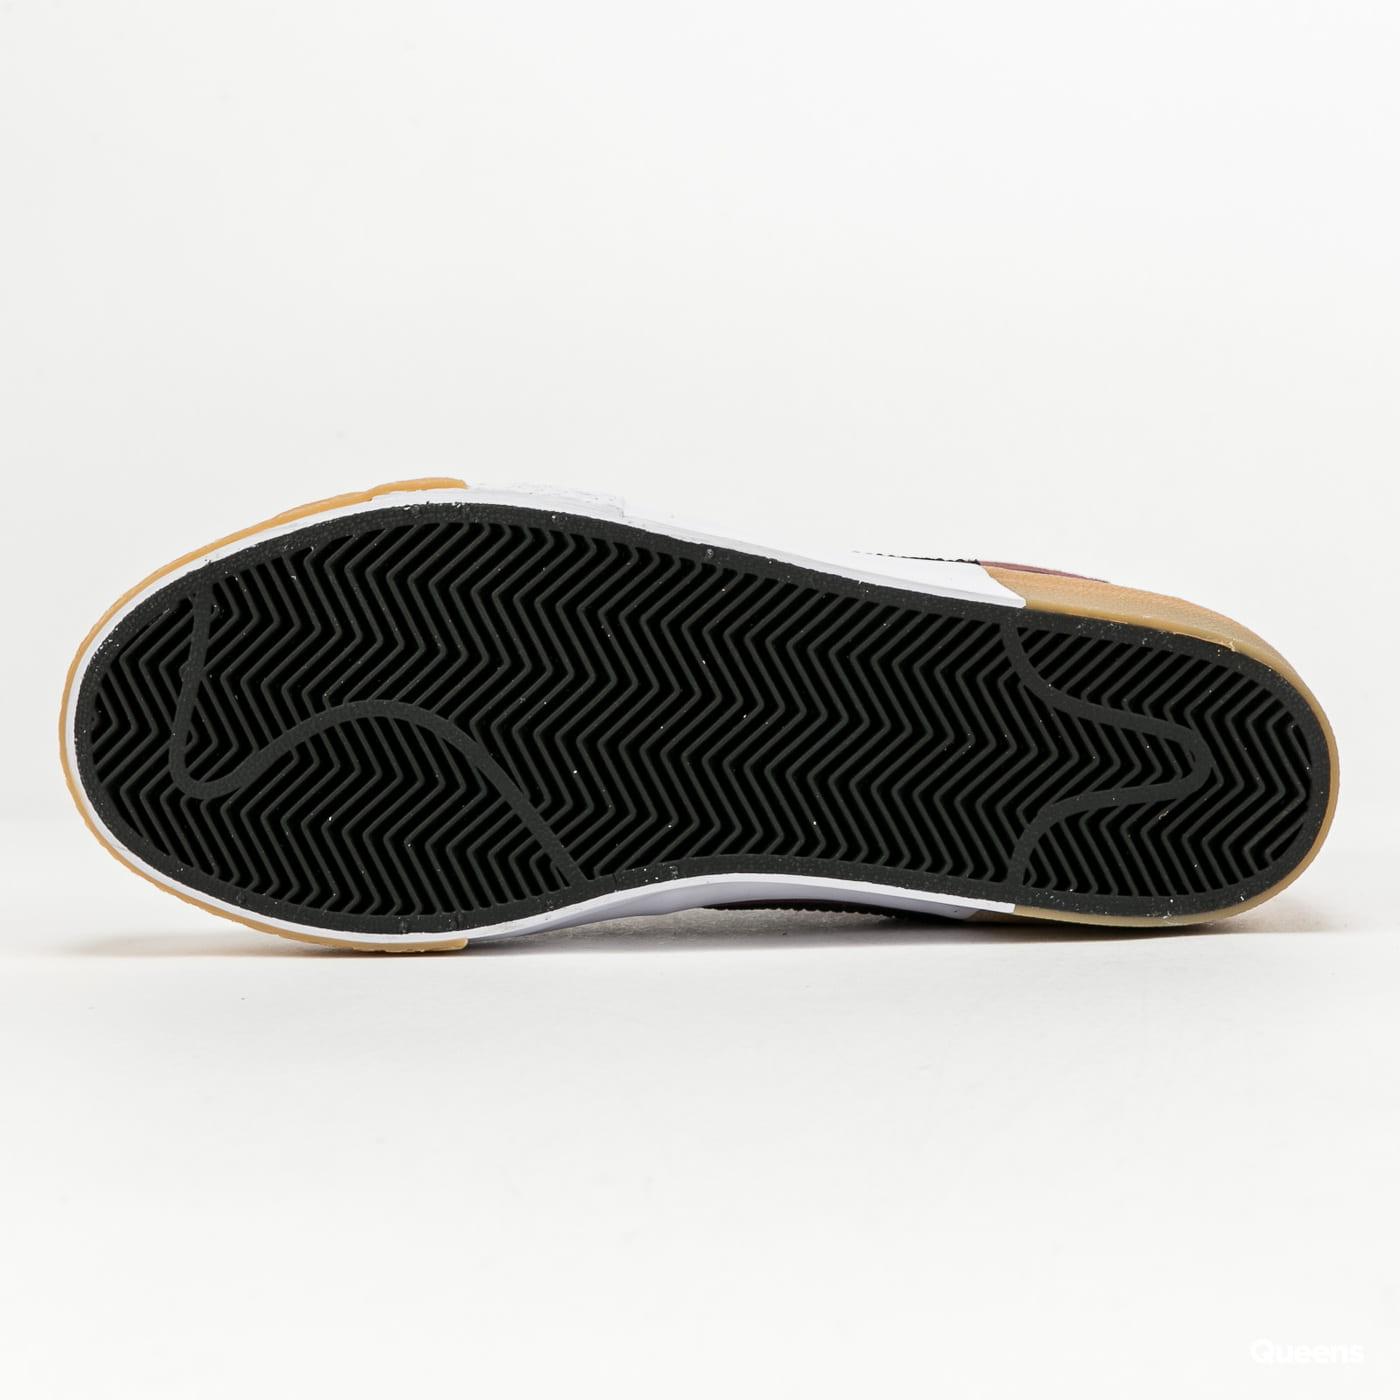 Nike SB Zoom Blazer Mid Premium dark wine / black - ink oxford